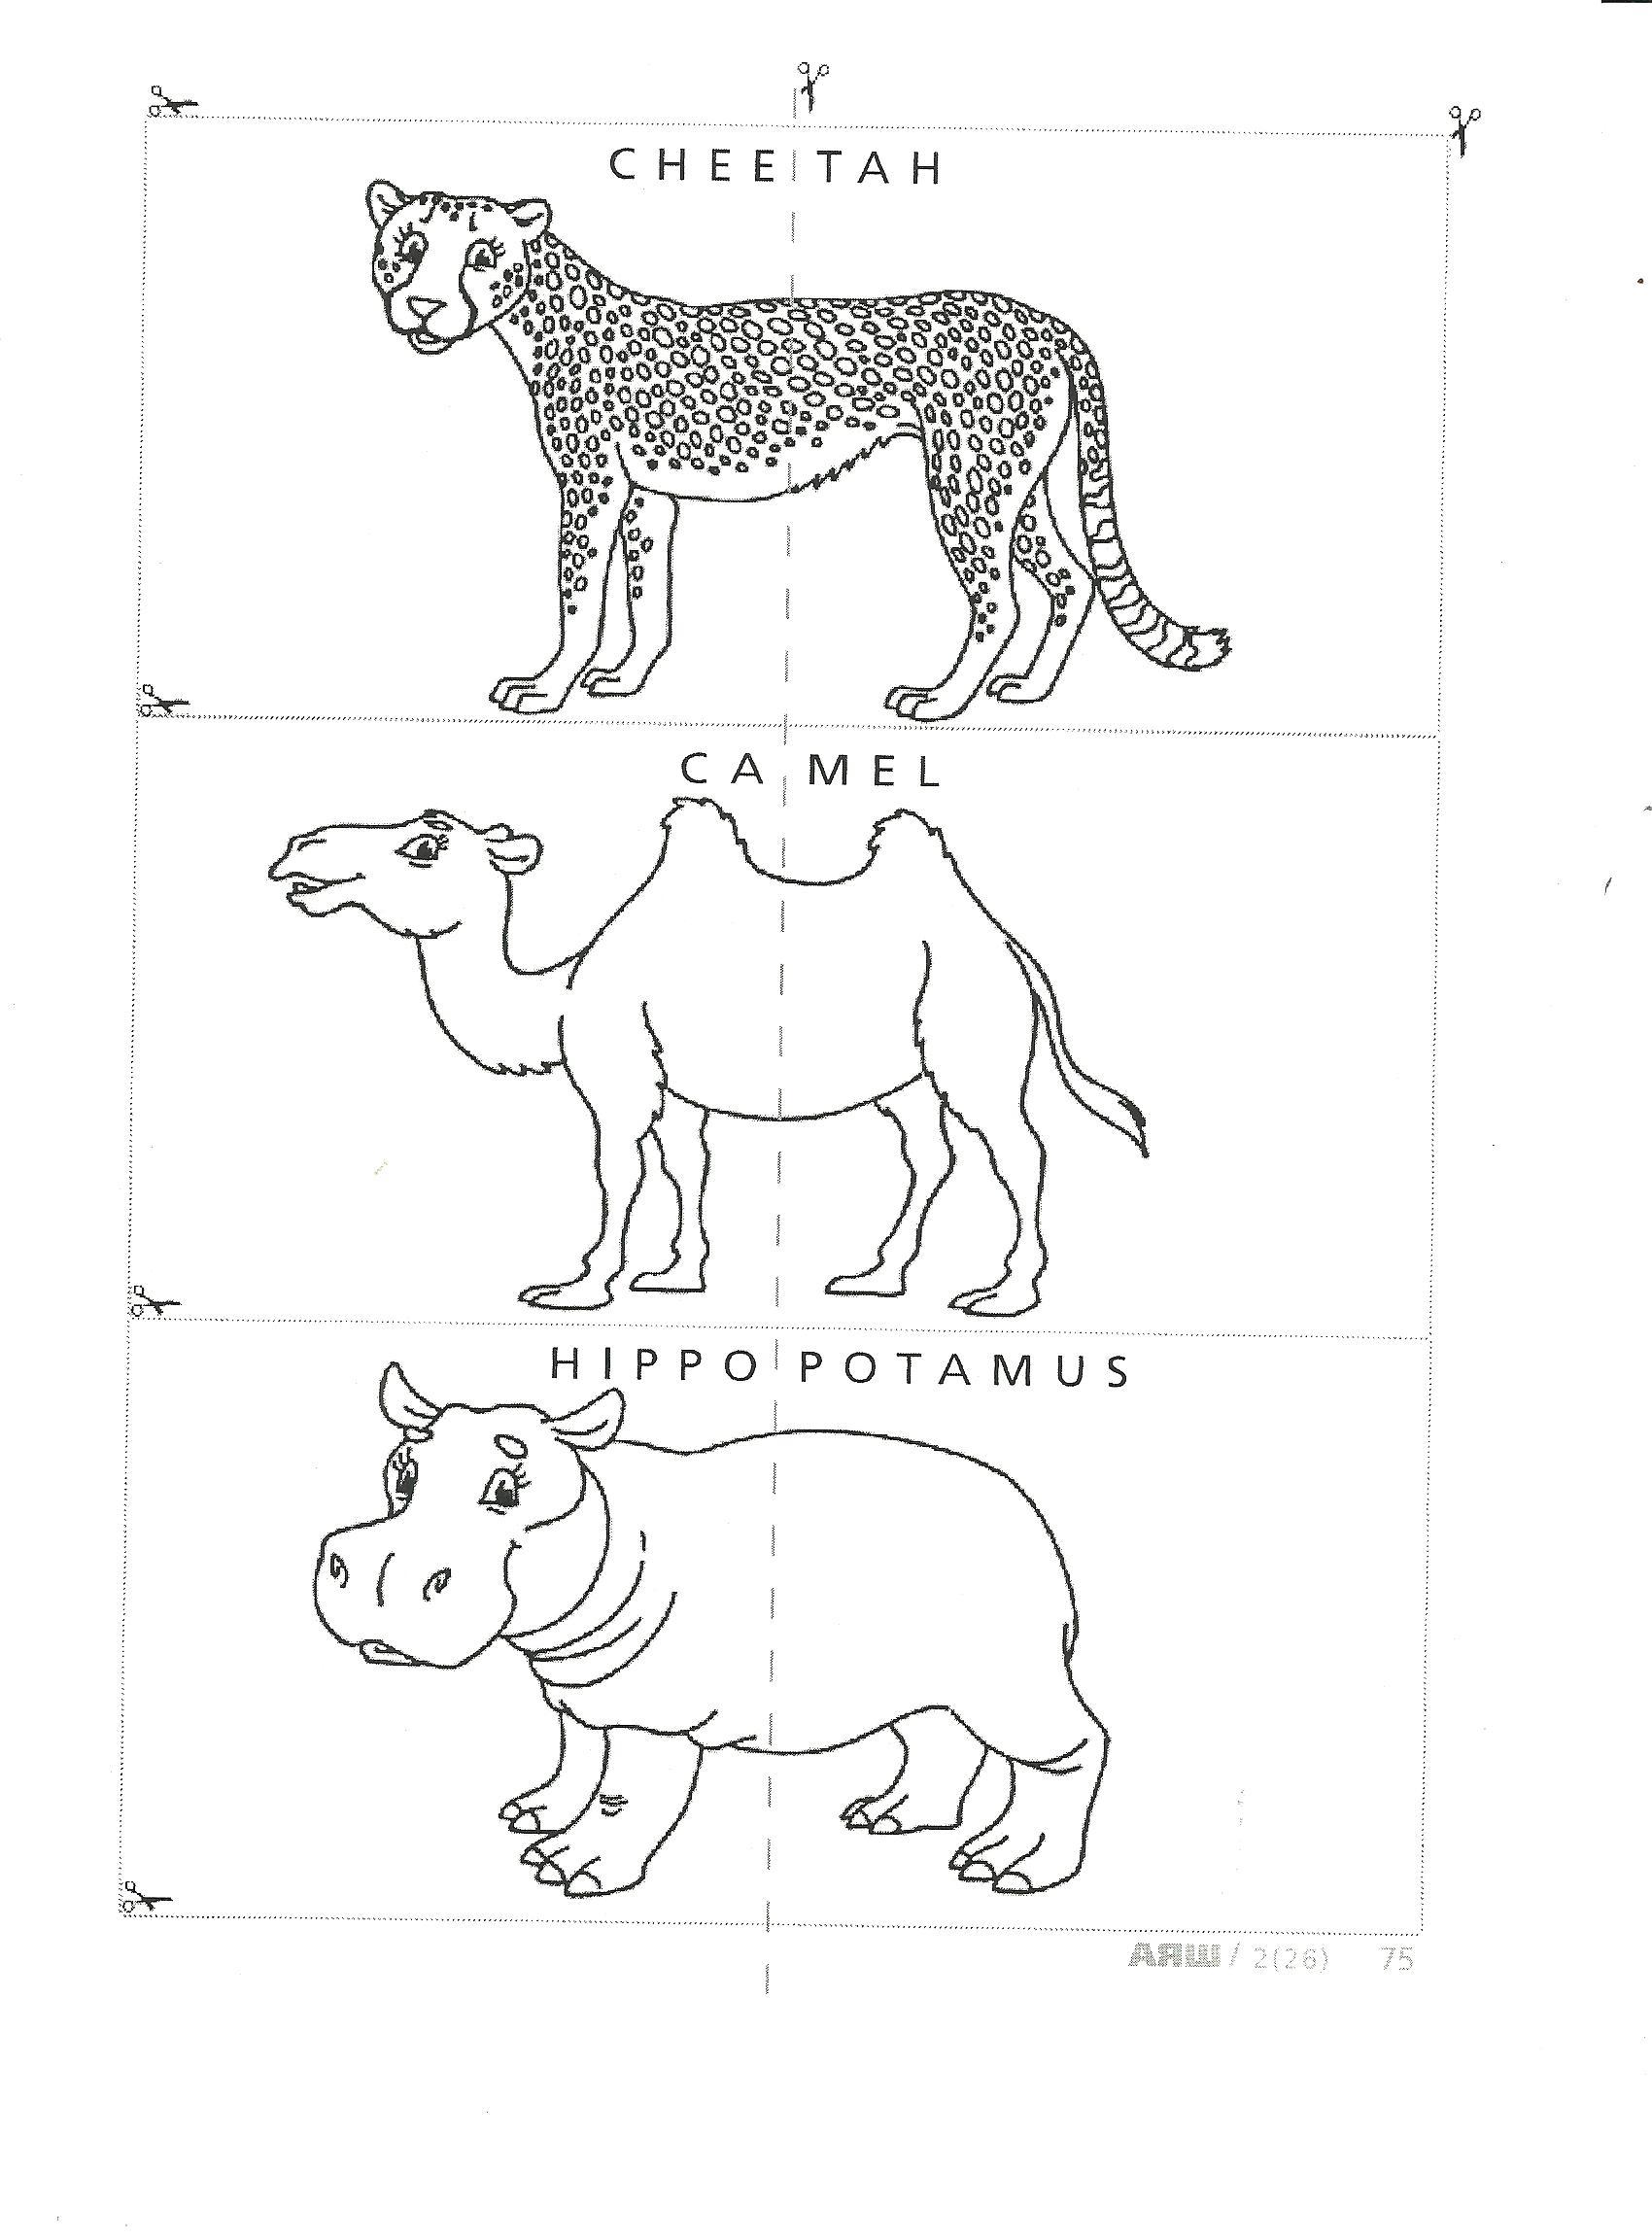 G:\Урок английского языка Животные Сафари Парка 3 класс УМК Millie учитель Штурмина ОС шк№18\Приложение2.jpg